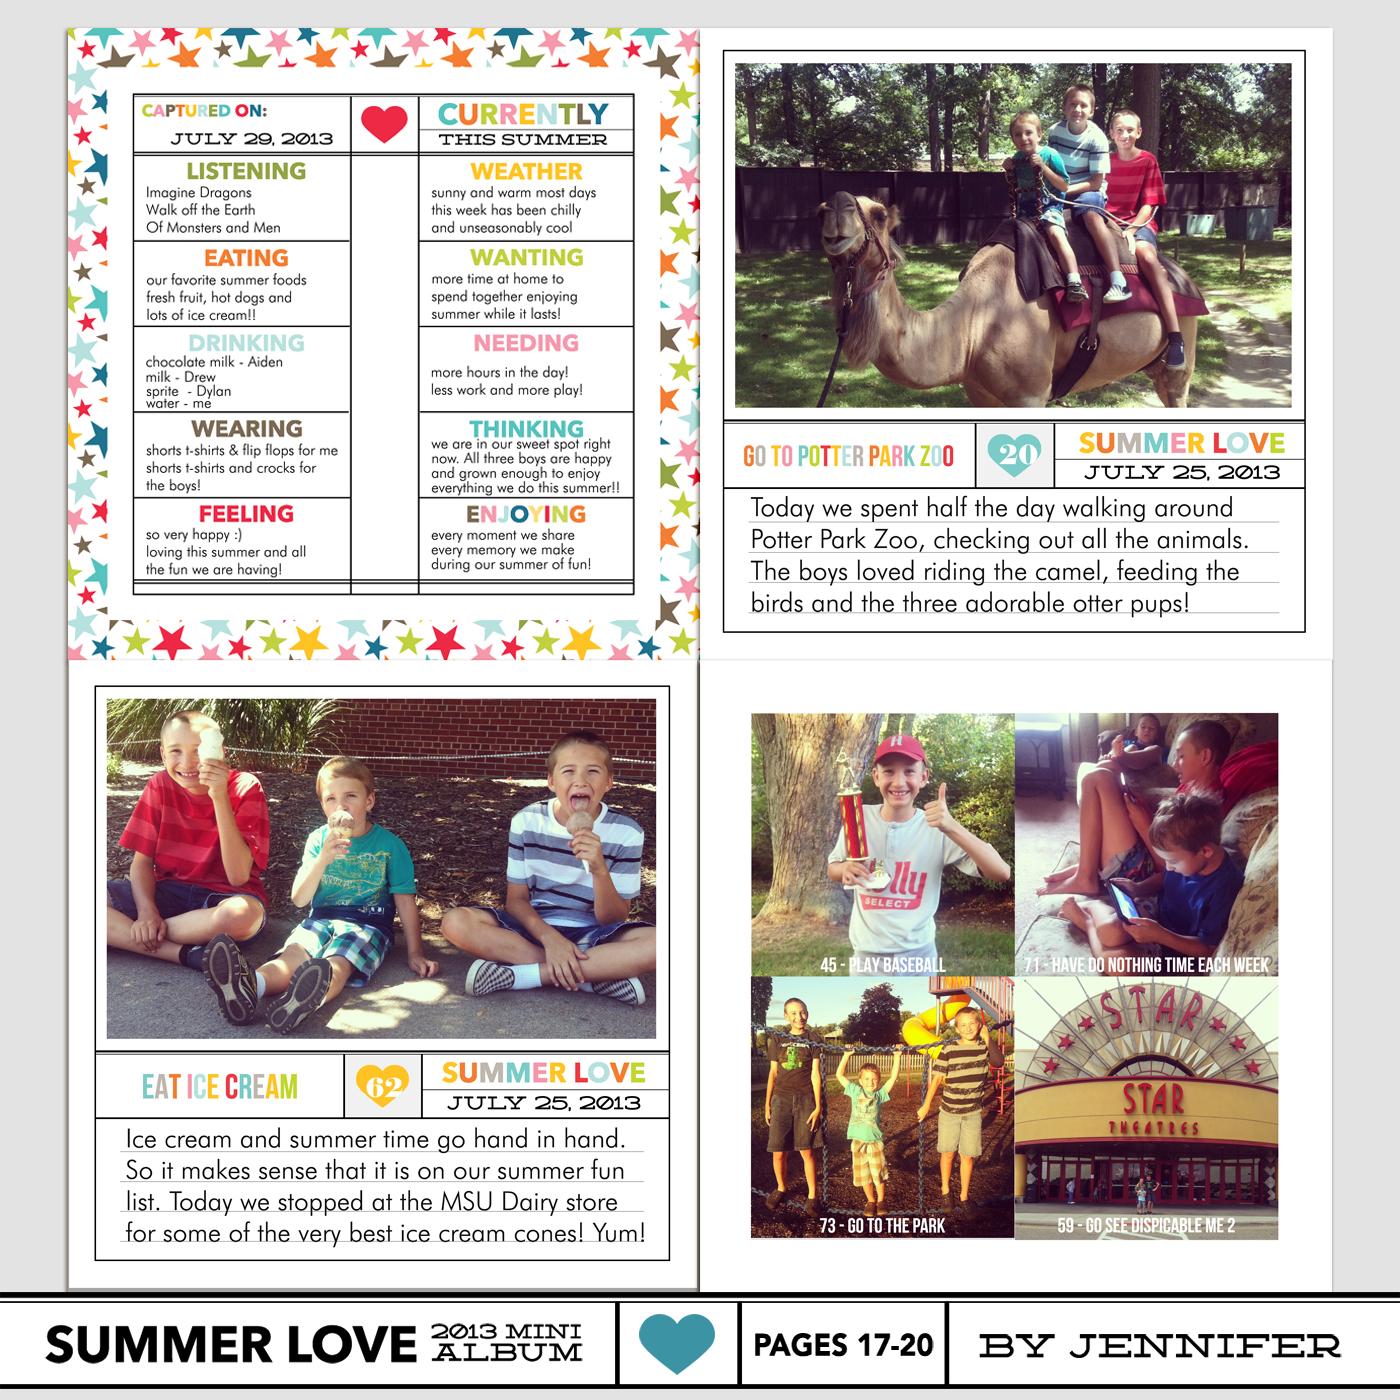 JenniferH_SummerLove-pg17-20-